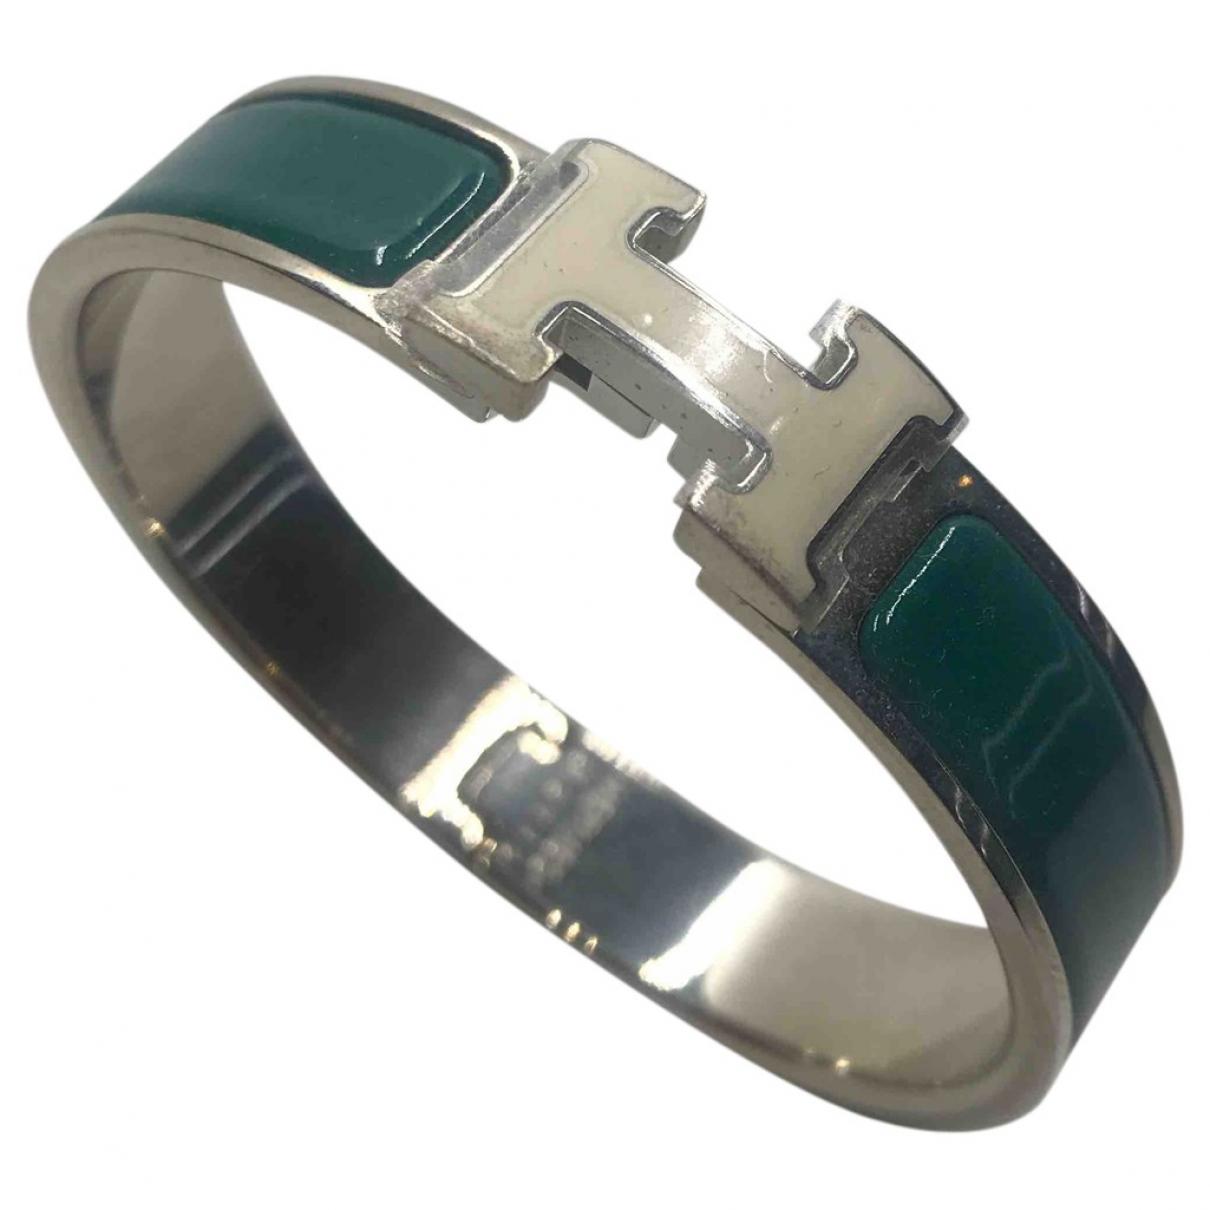 Hermes Clic H Armband in  Gruen Metall